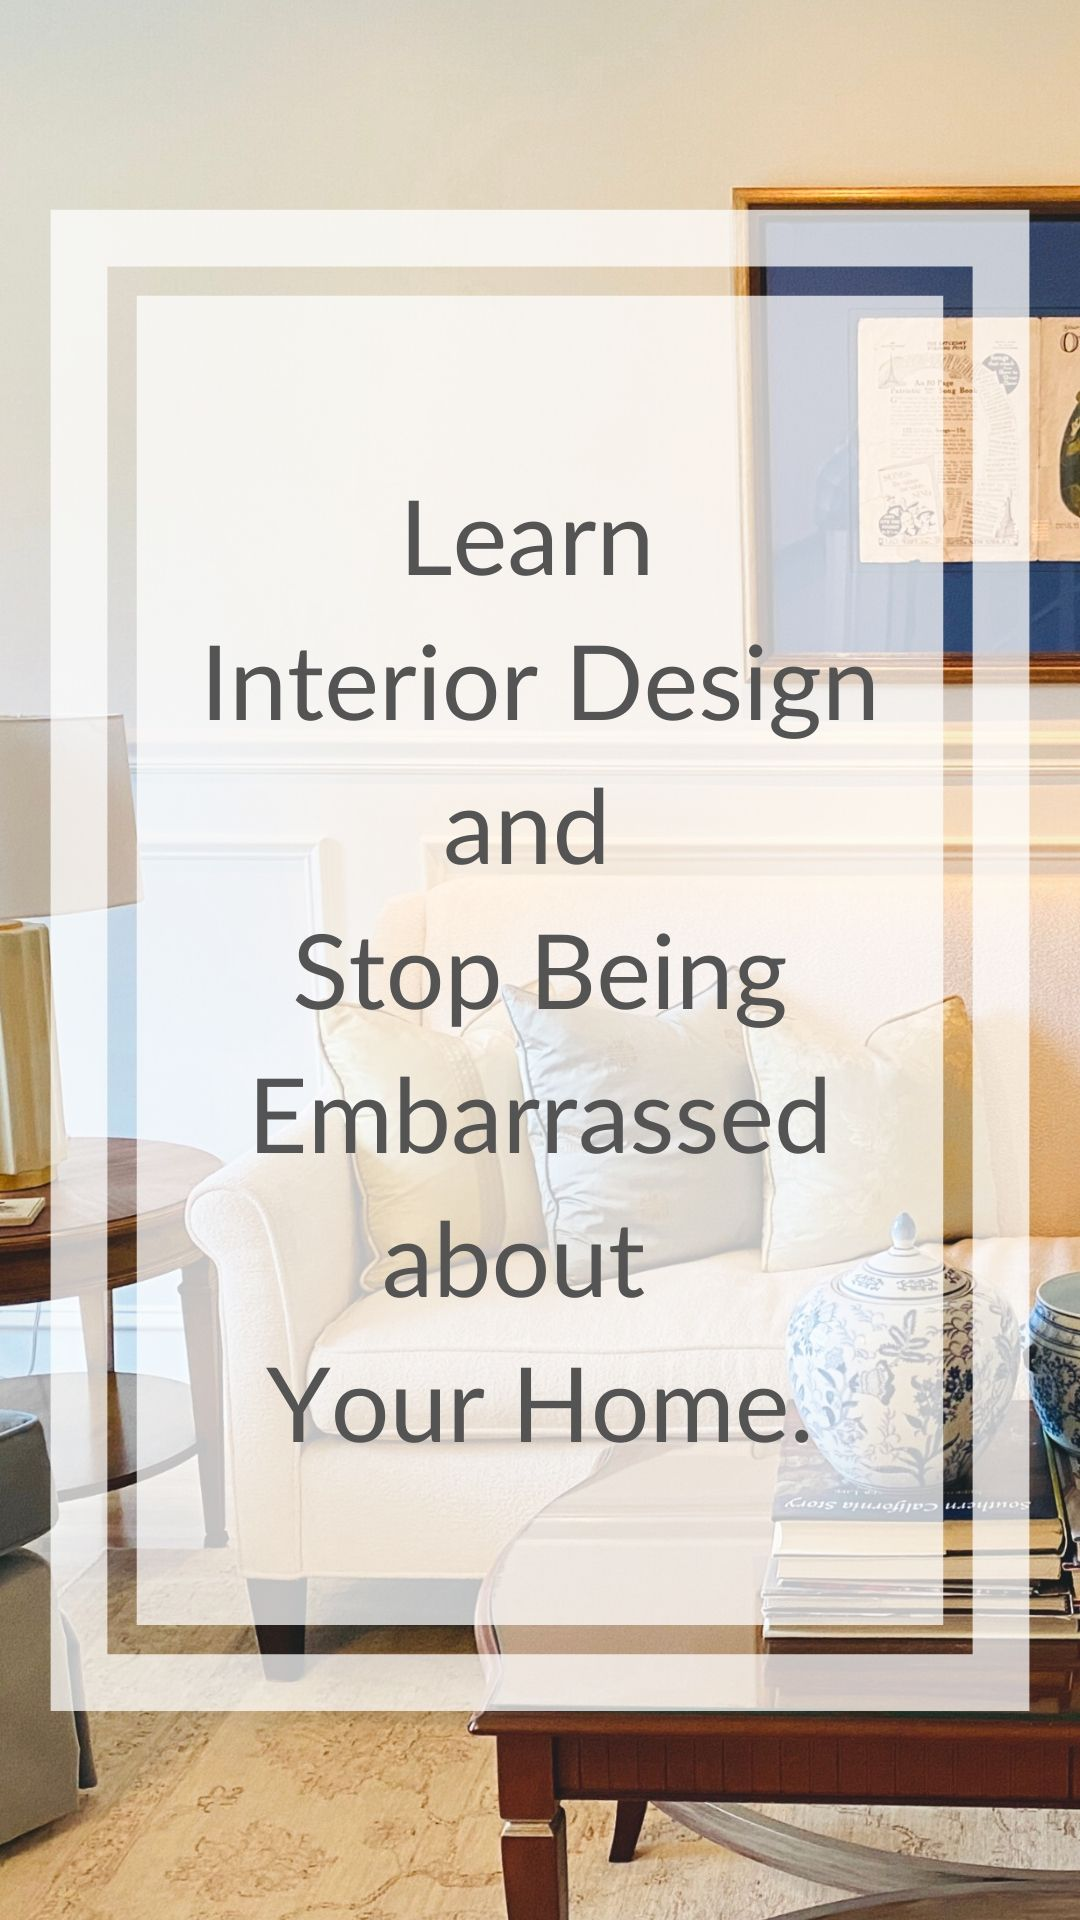 Learn Interior Design Learn Interior Design Bathroom Design Decor Interior Design Courses